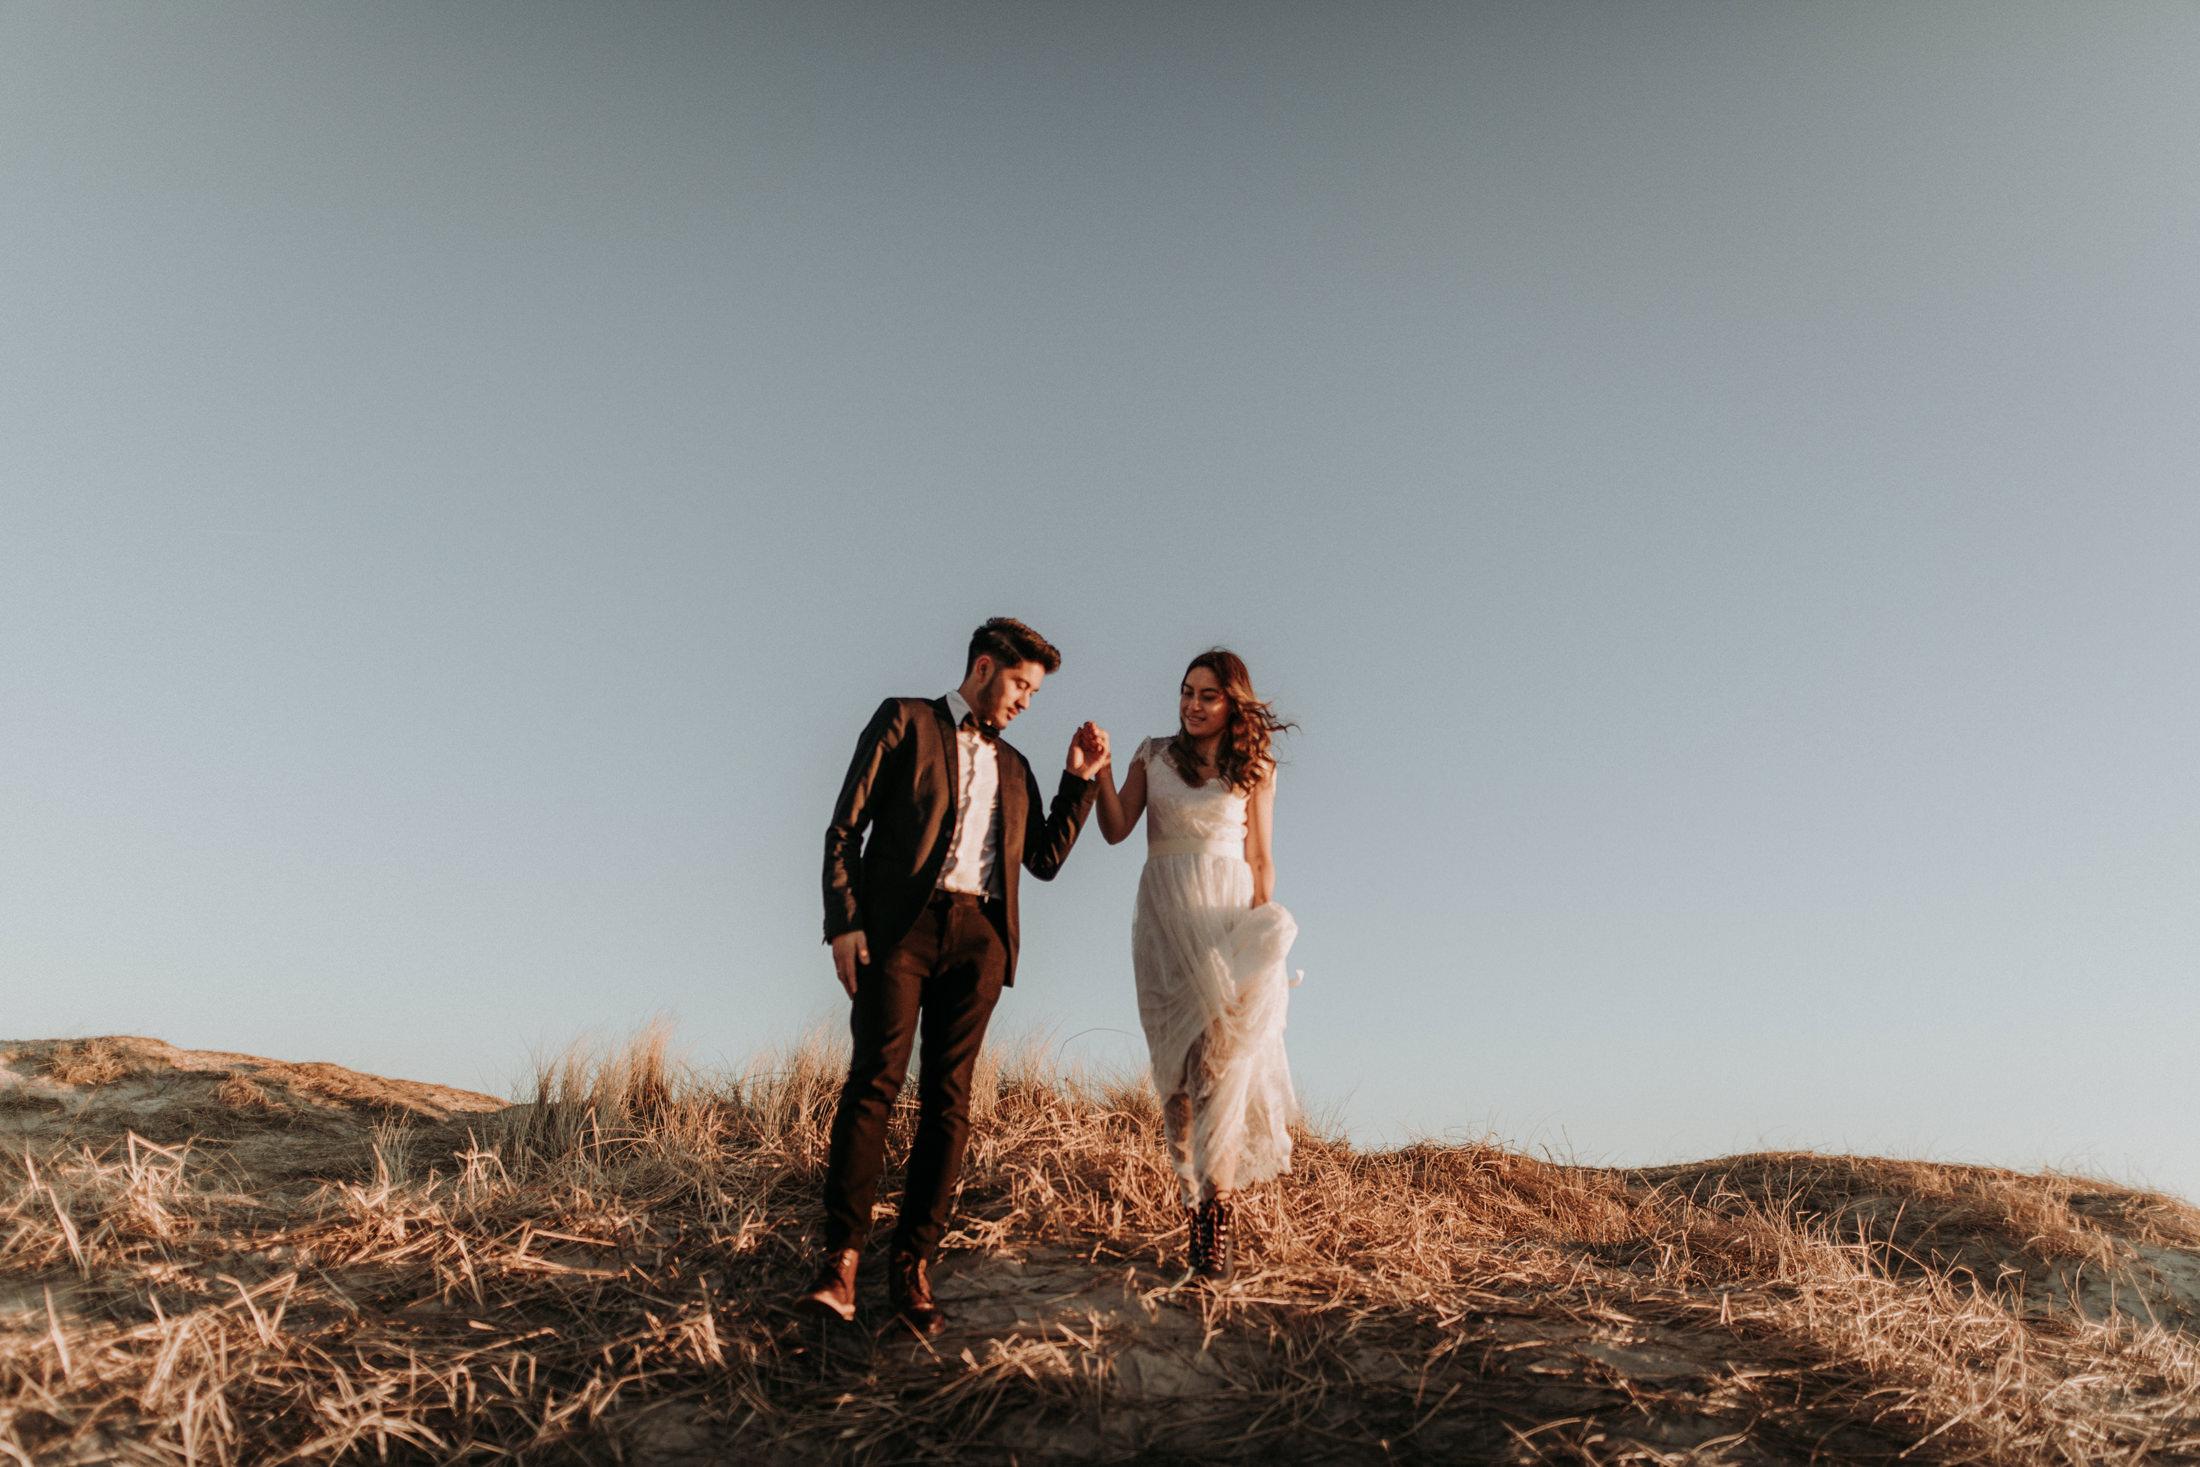 Wedding_Photographer_Mallorca_Daniela-Marquardt_Photography_CanaryIslands_Lanzarote_Iceland_Tuskany_Santorini_Portugal_Schweiz_Austria_Bayern_Elopement_Hochzeitsfotograf_Norddeichich_50